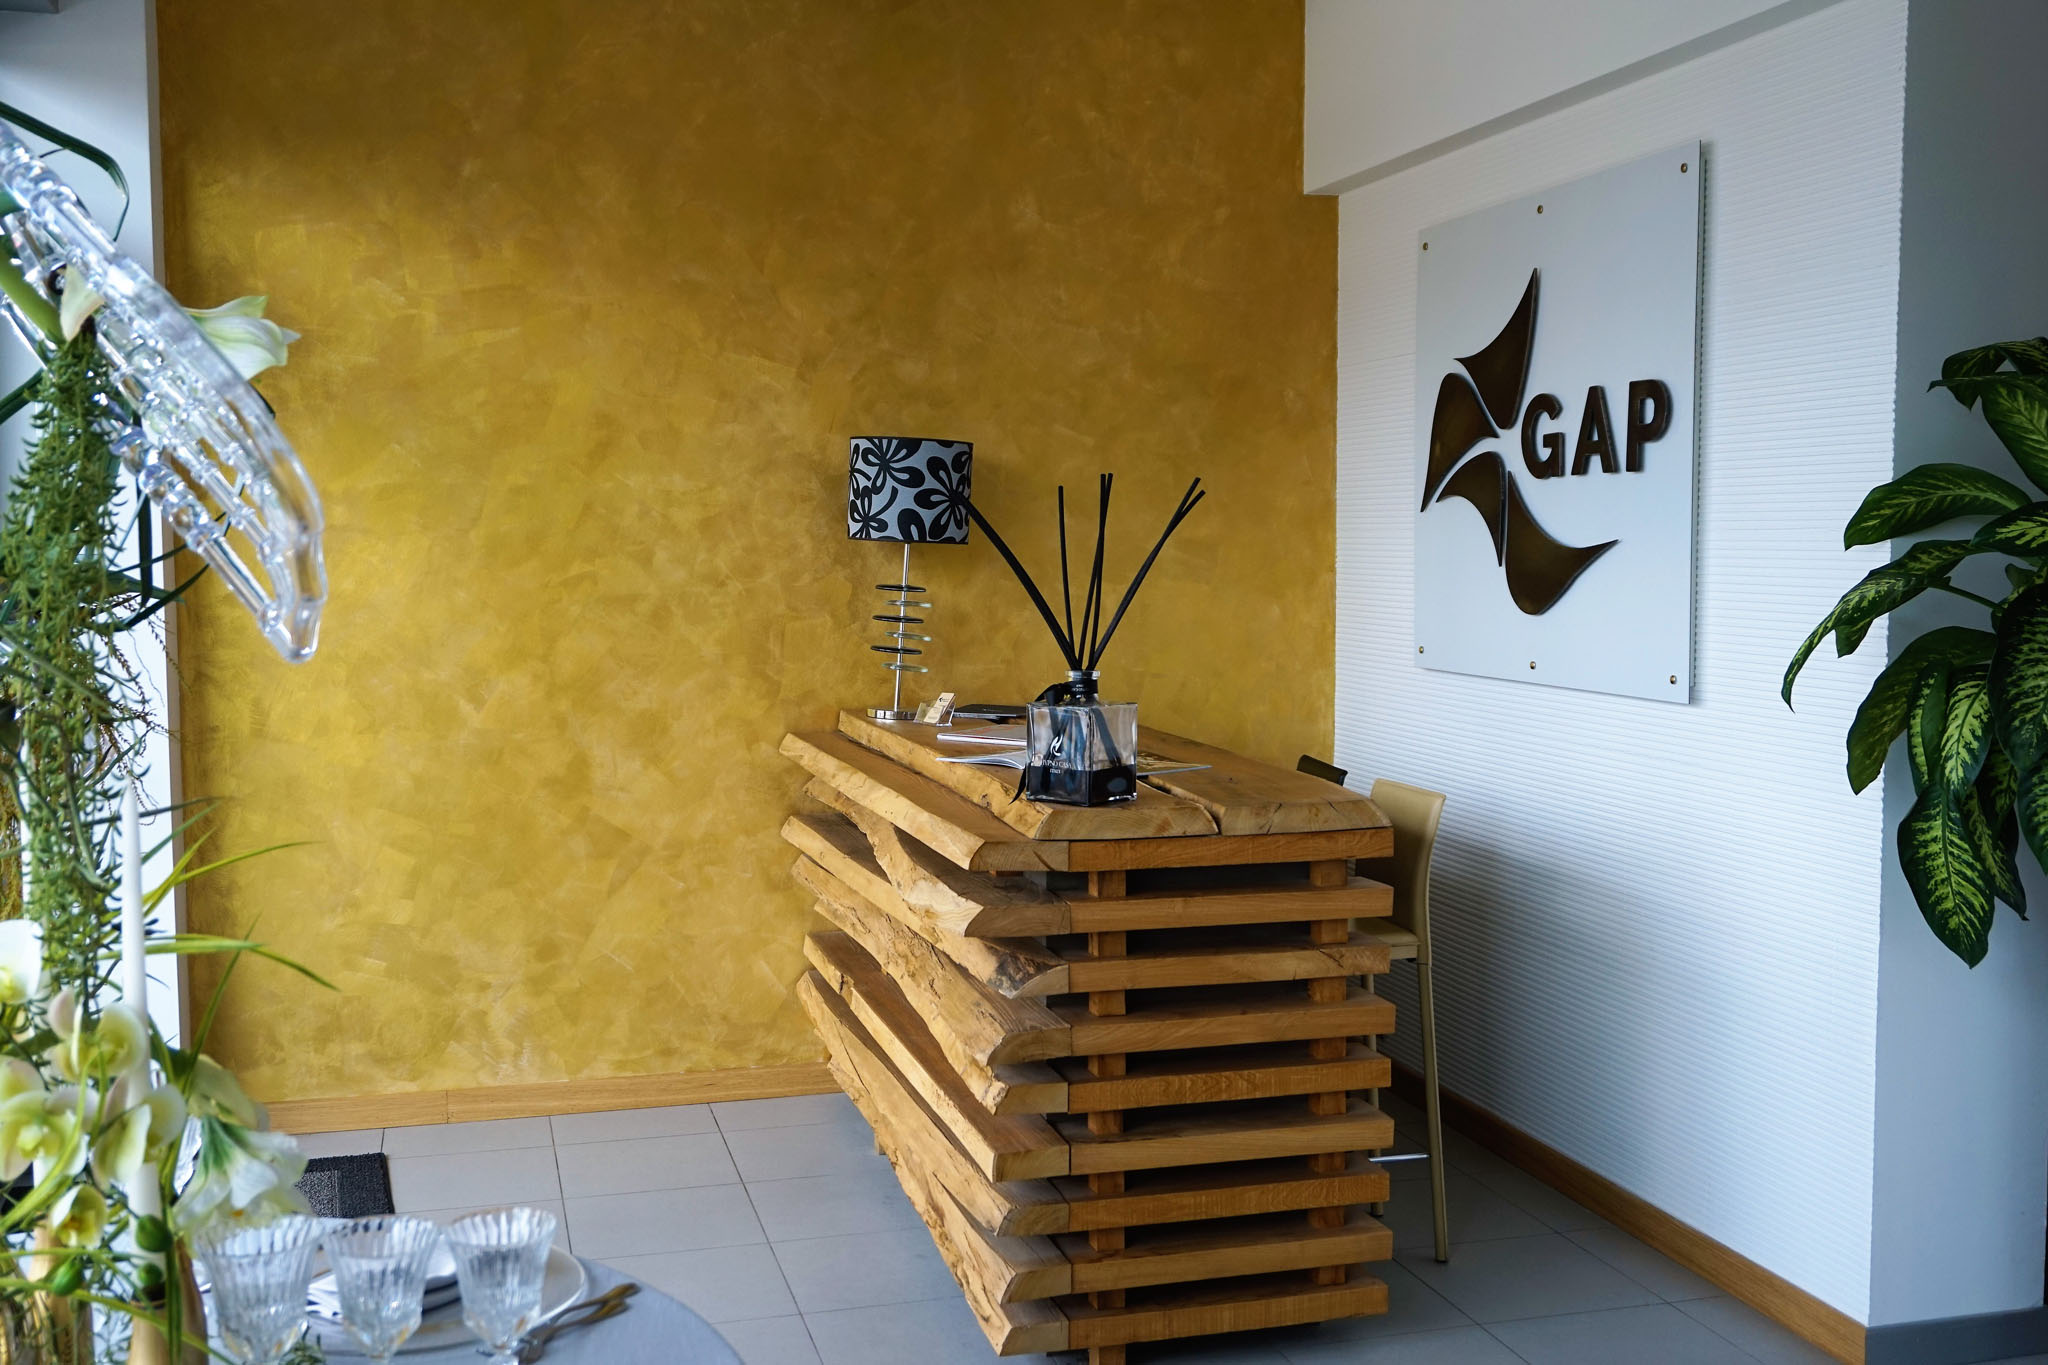 Atelier Gap Eventi